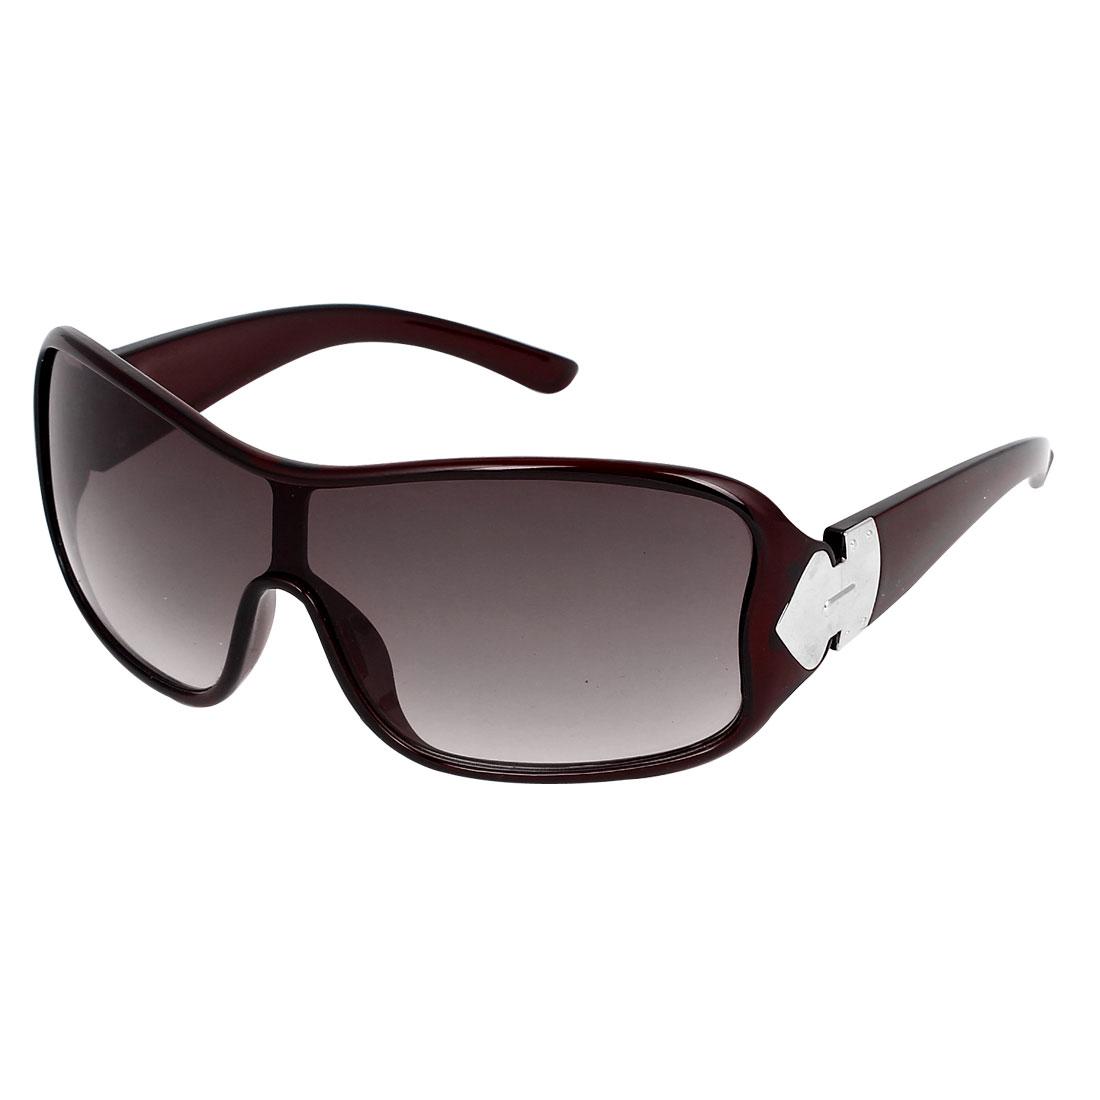 Plastic Full Rim Women Single Bridge Eyewear Sunglasses Brown